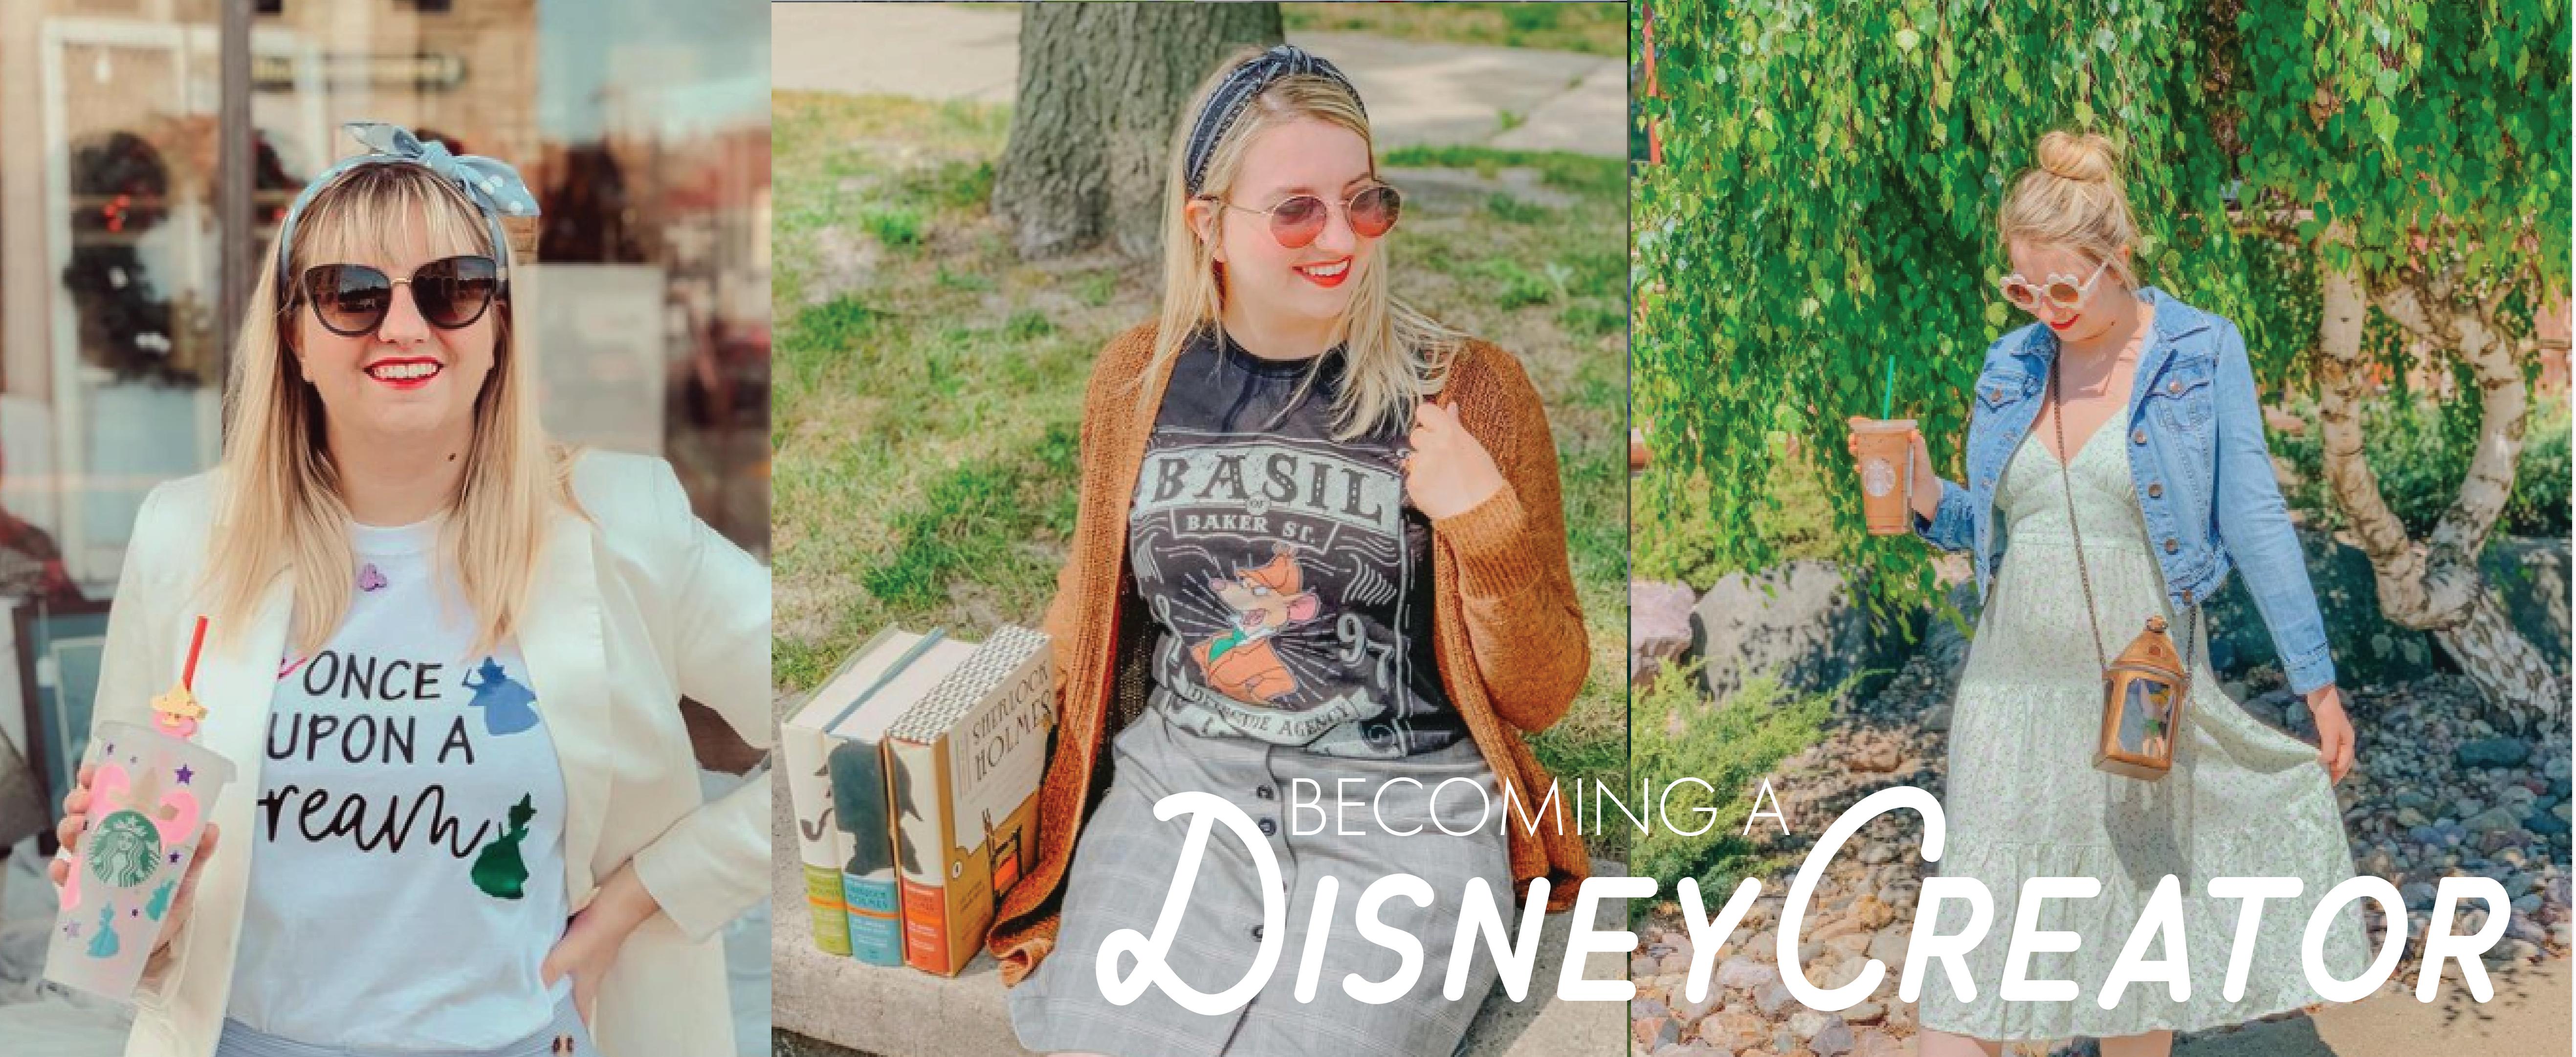 Disney Instagram Advice